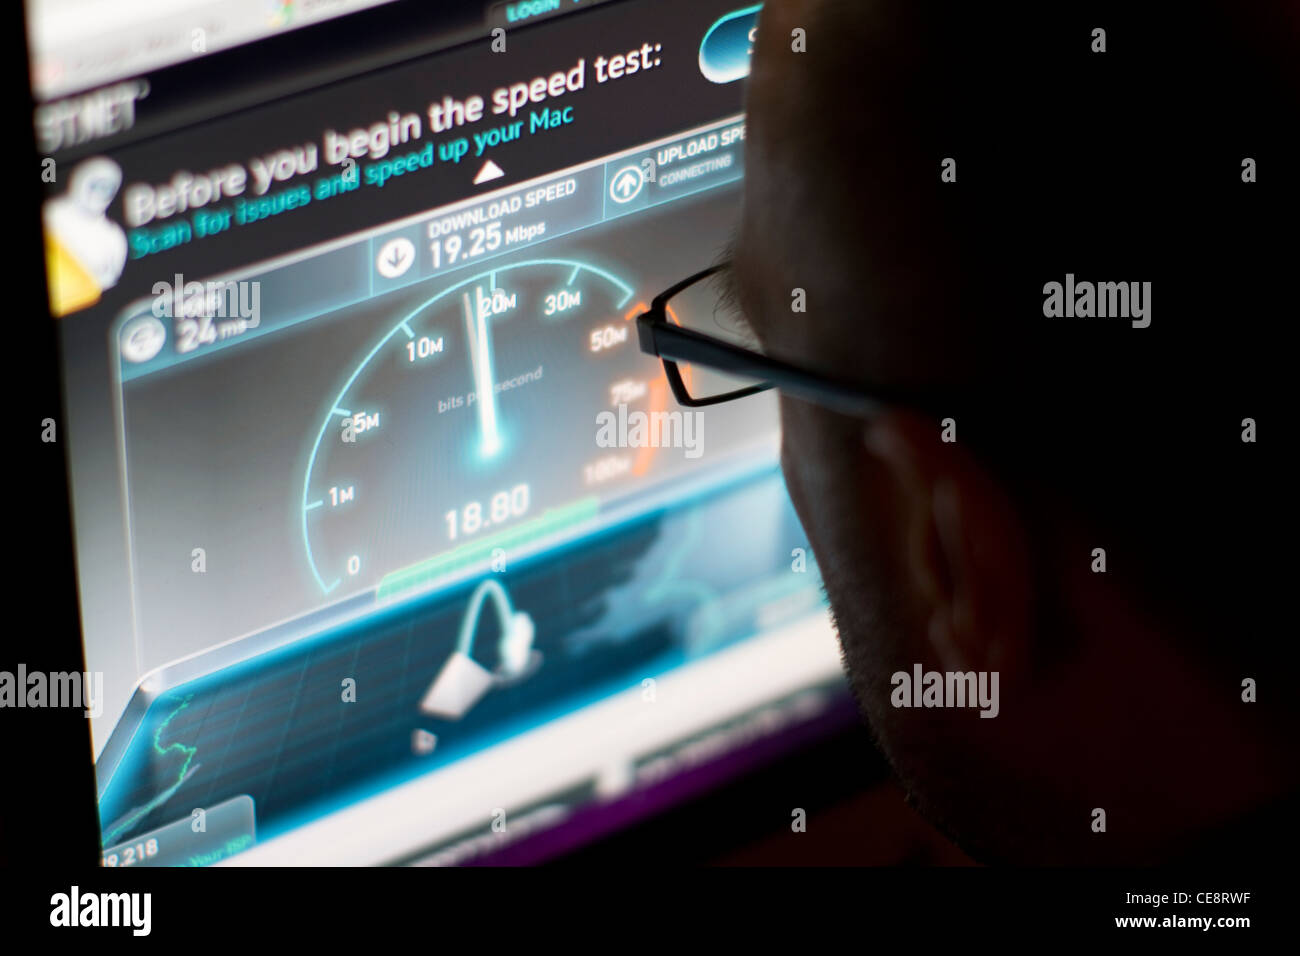 broadband speed tes